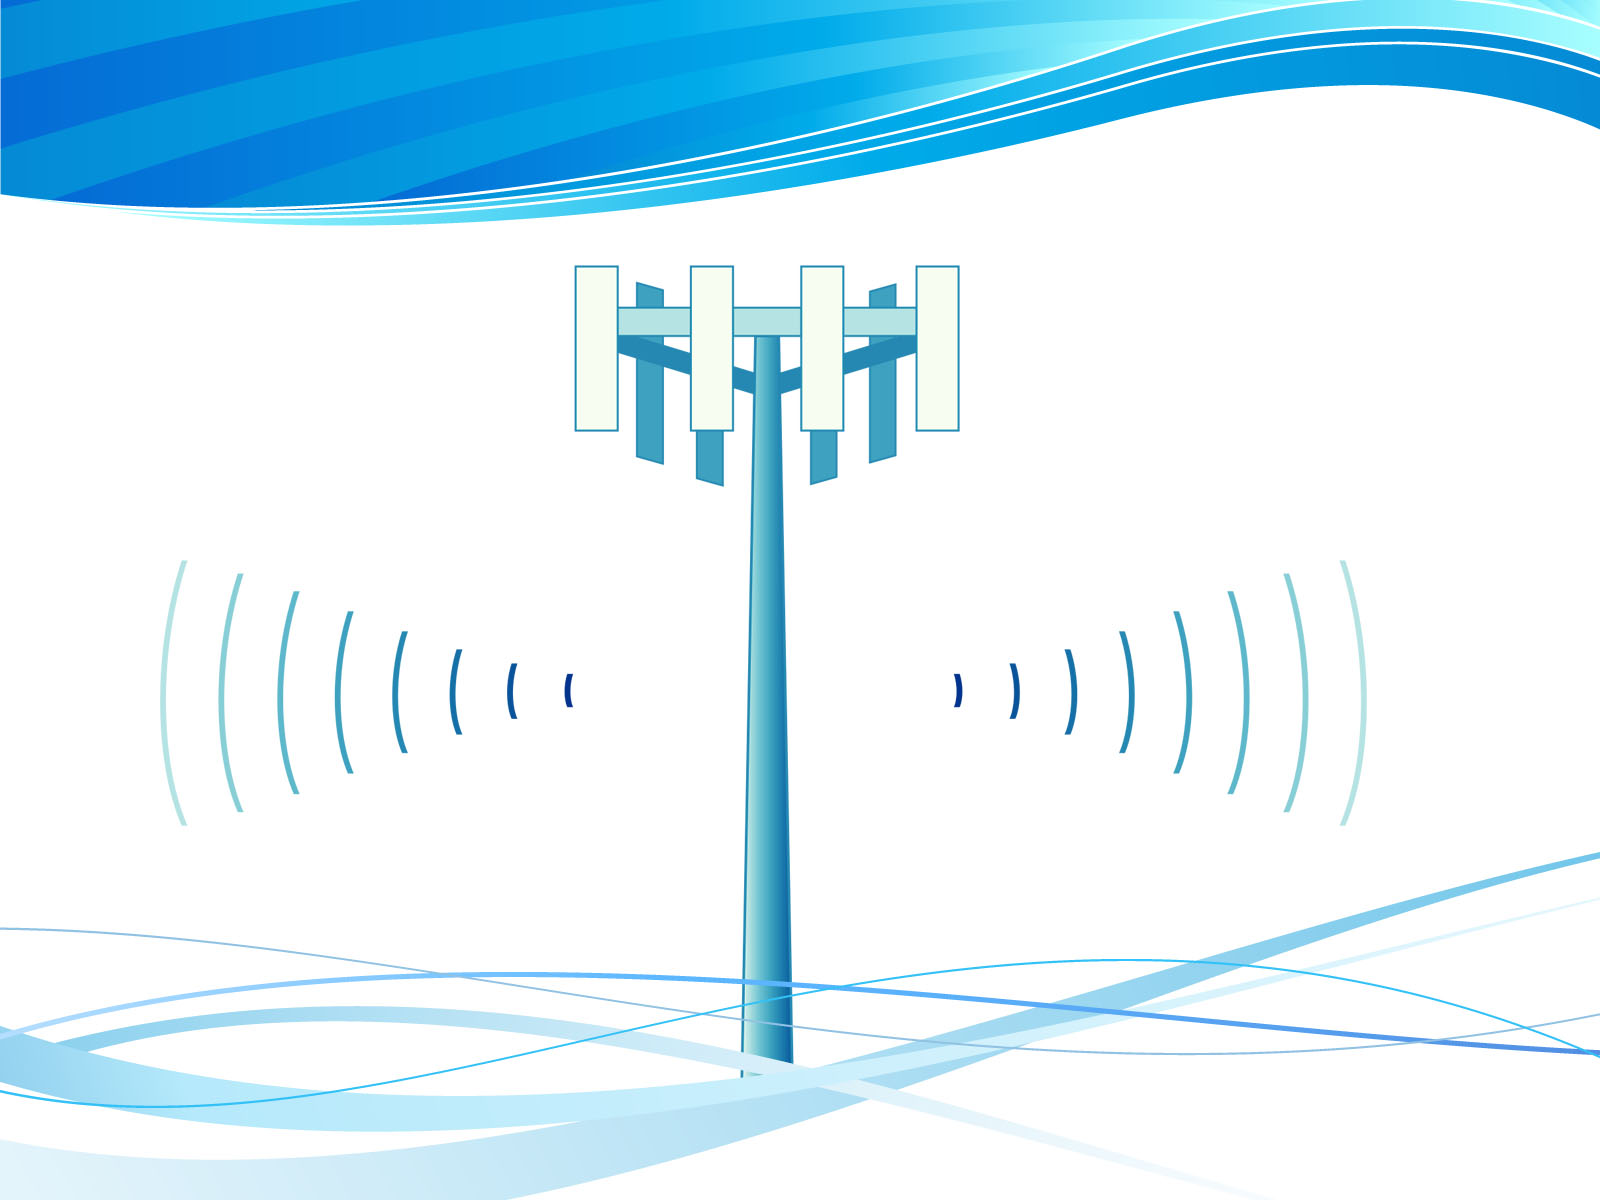 Wireless CellTower PPT Design PPT Backgrounds - Business, Technology ...